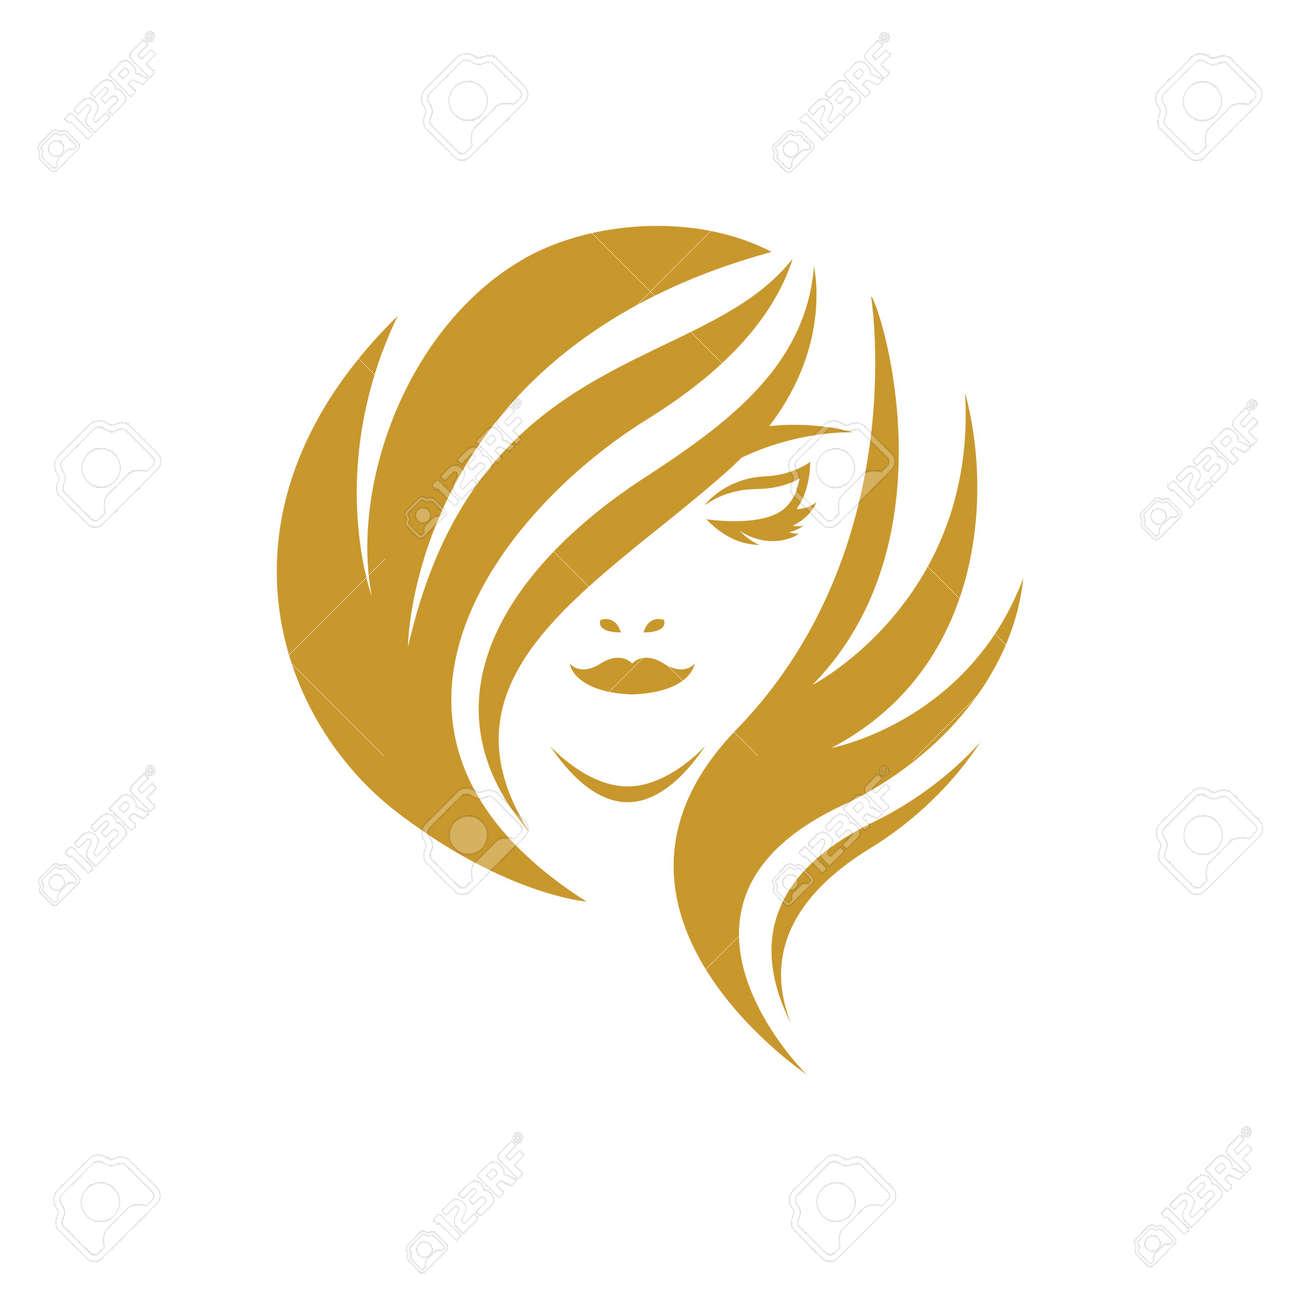 Beauty hair and salon logo images illustration design - 172261488